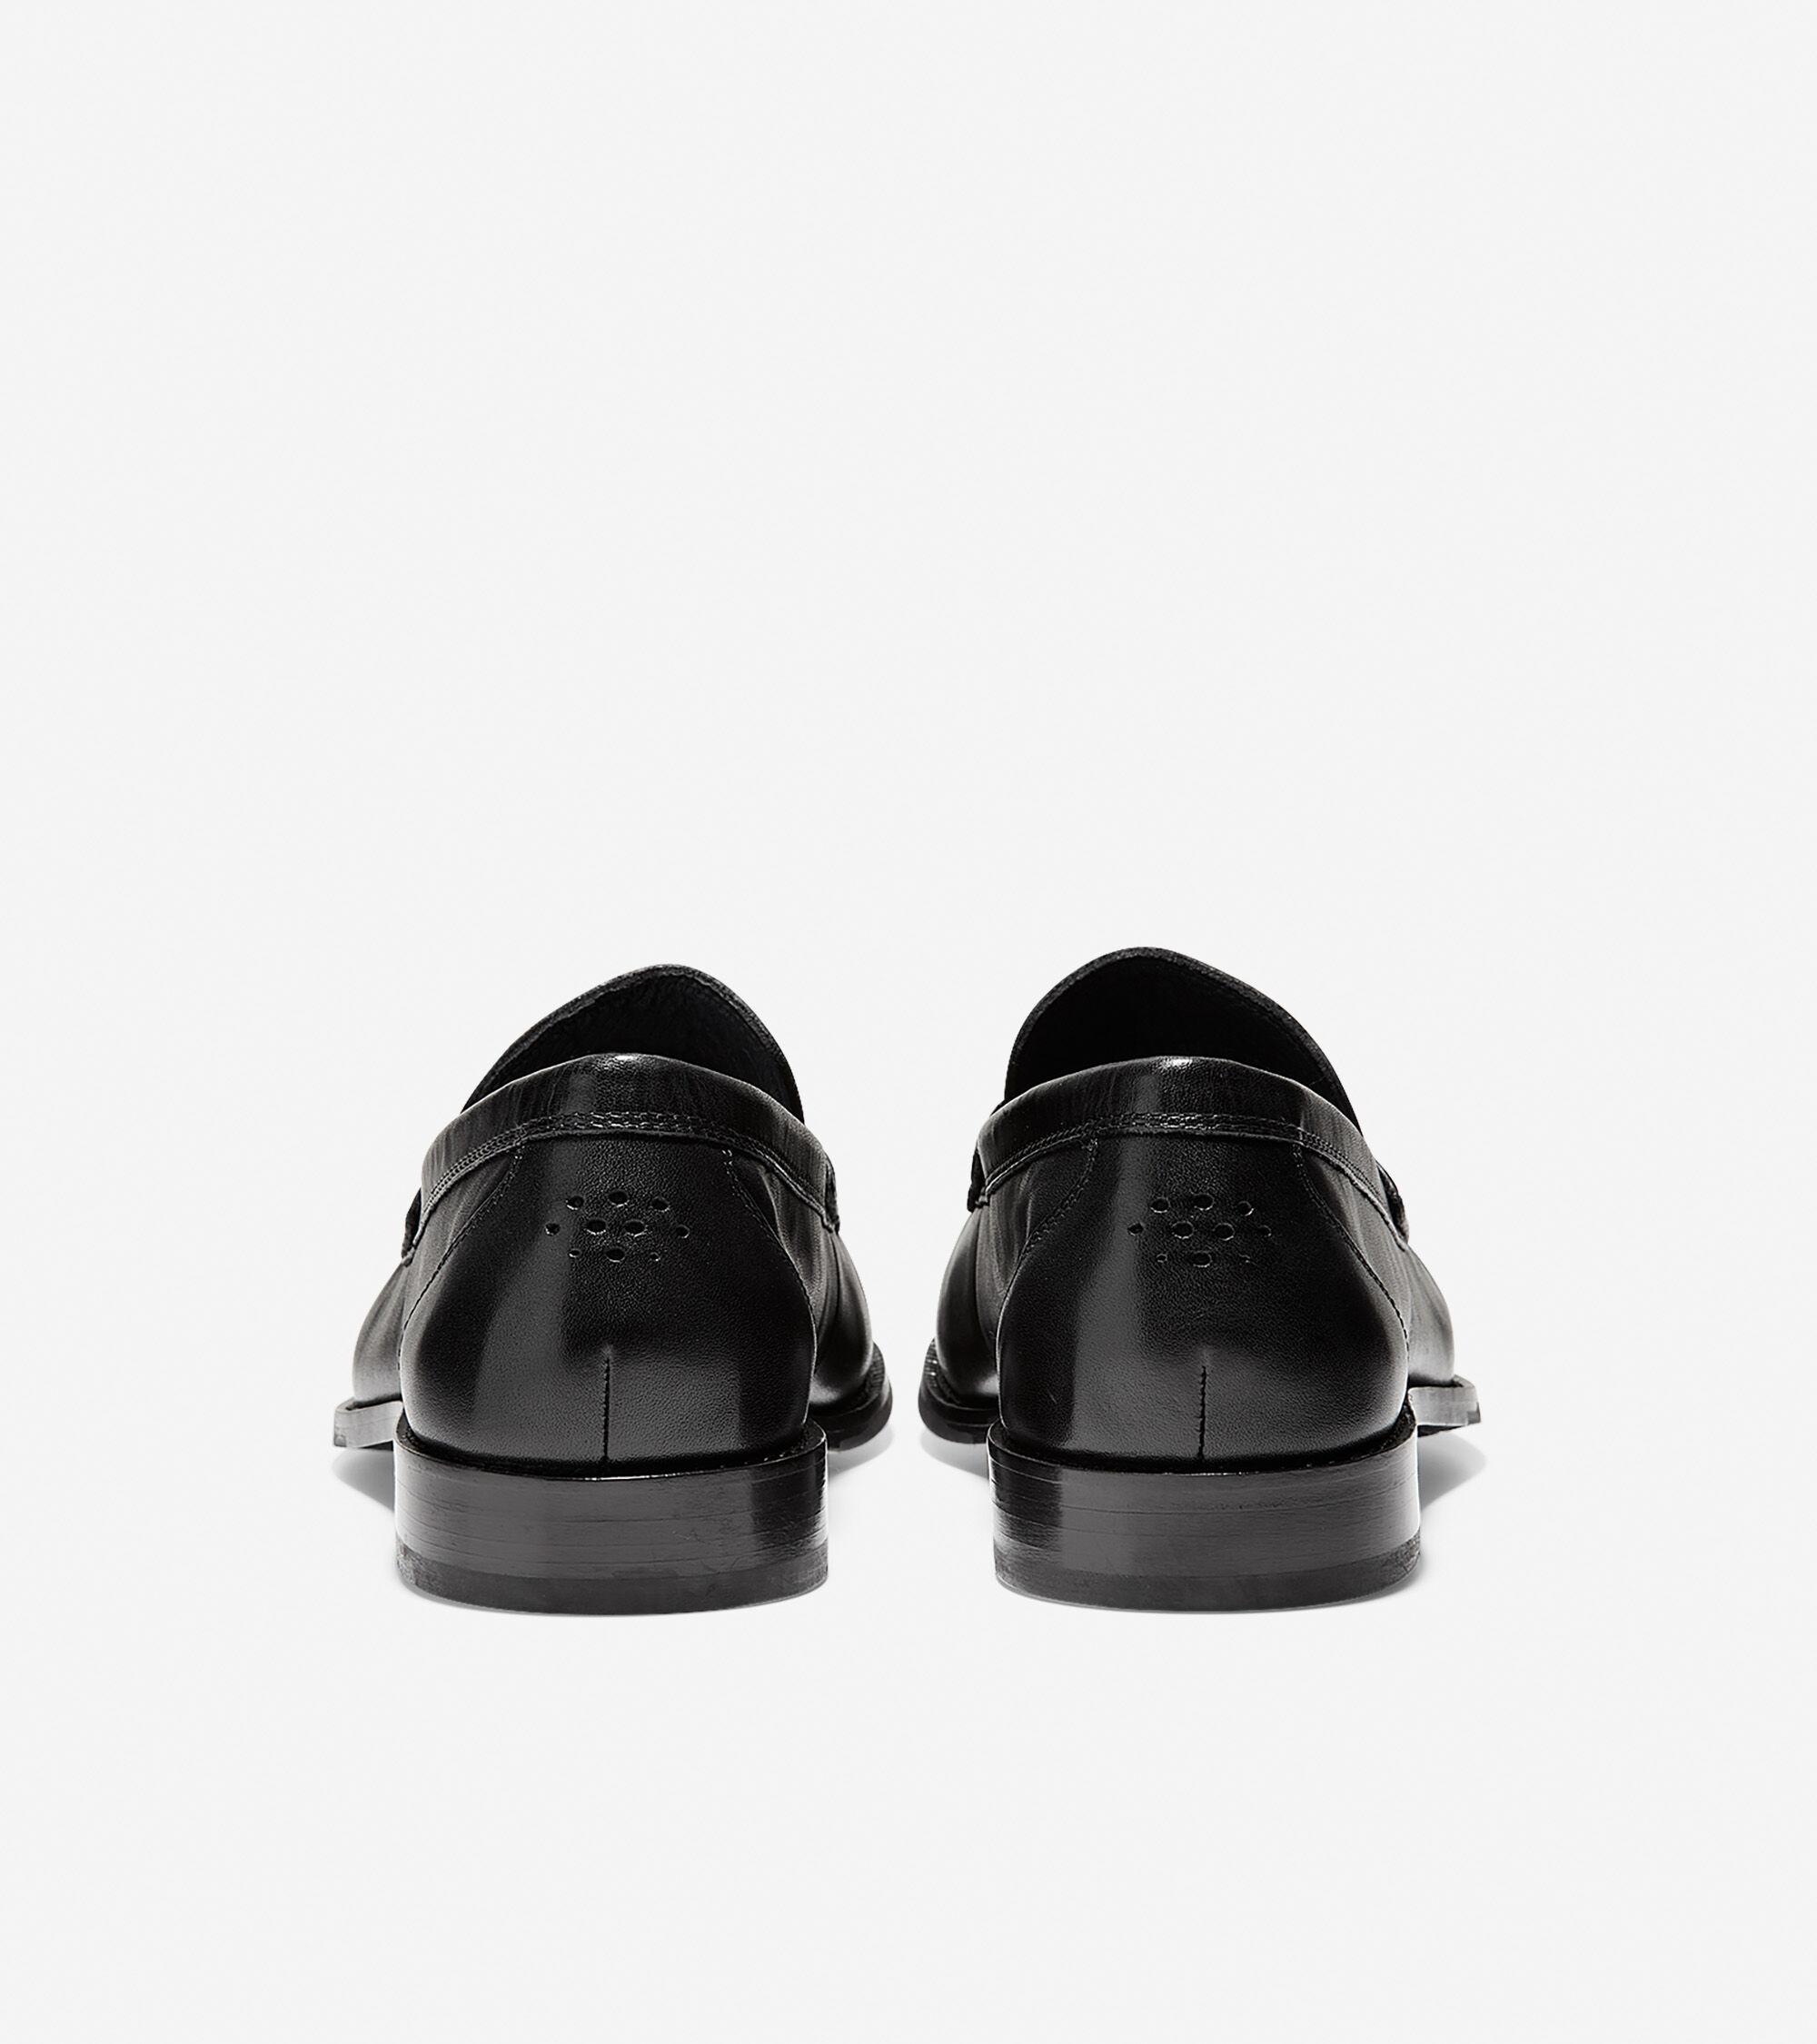 8d28b3fec6f Men s Pinch Grand Classic Tassel Loafers in Black